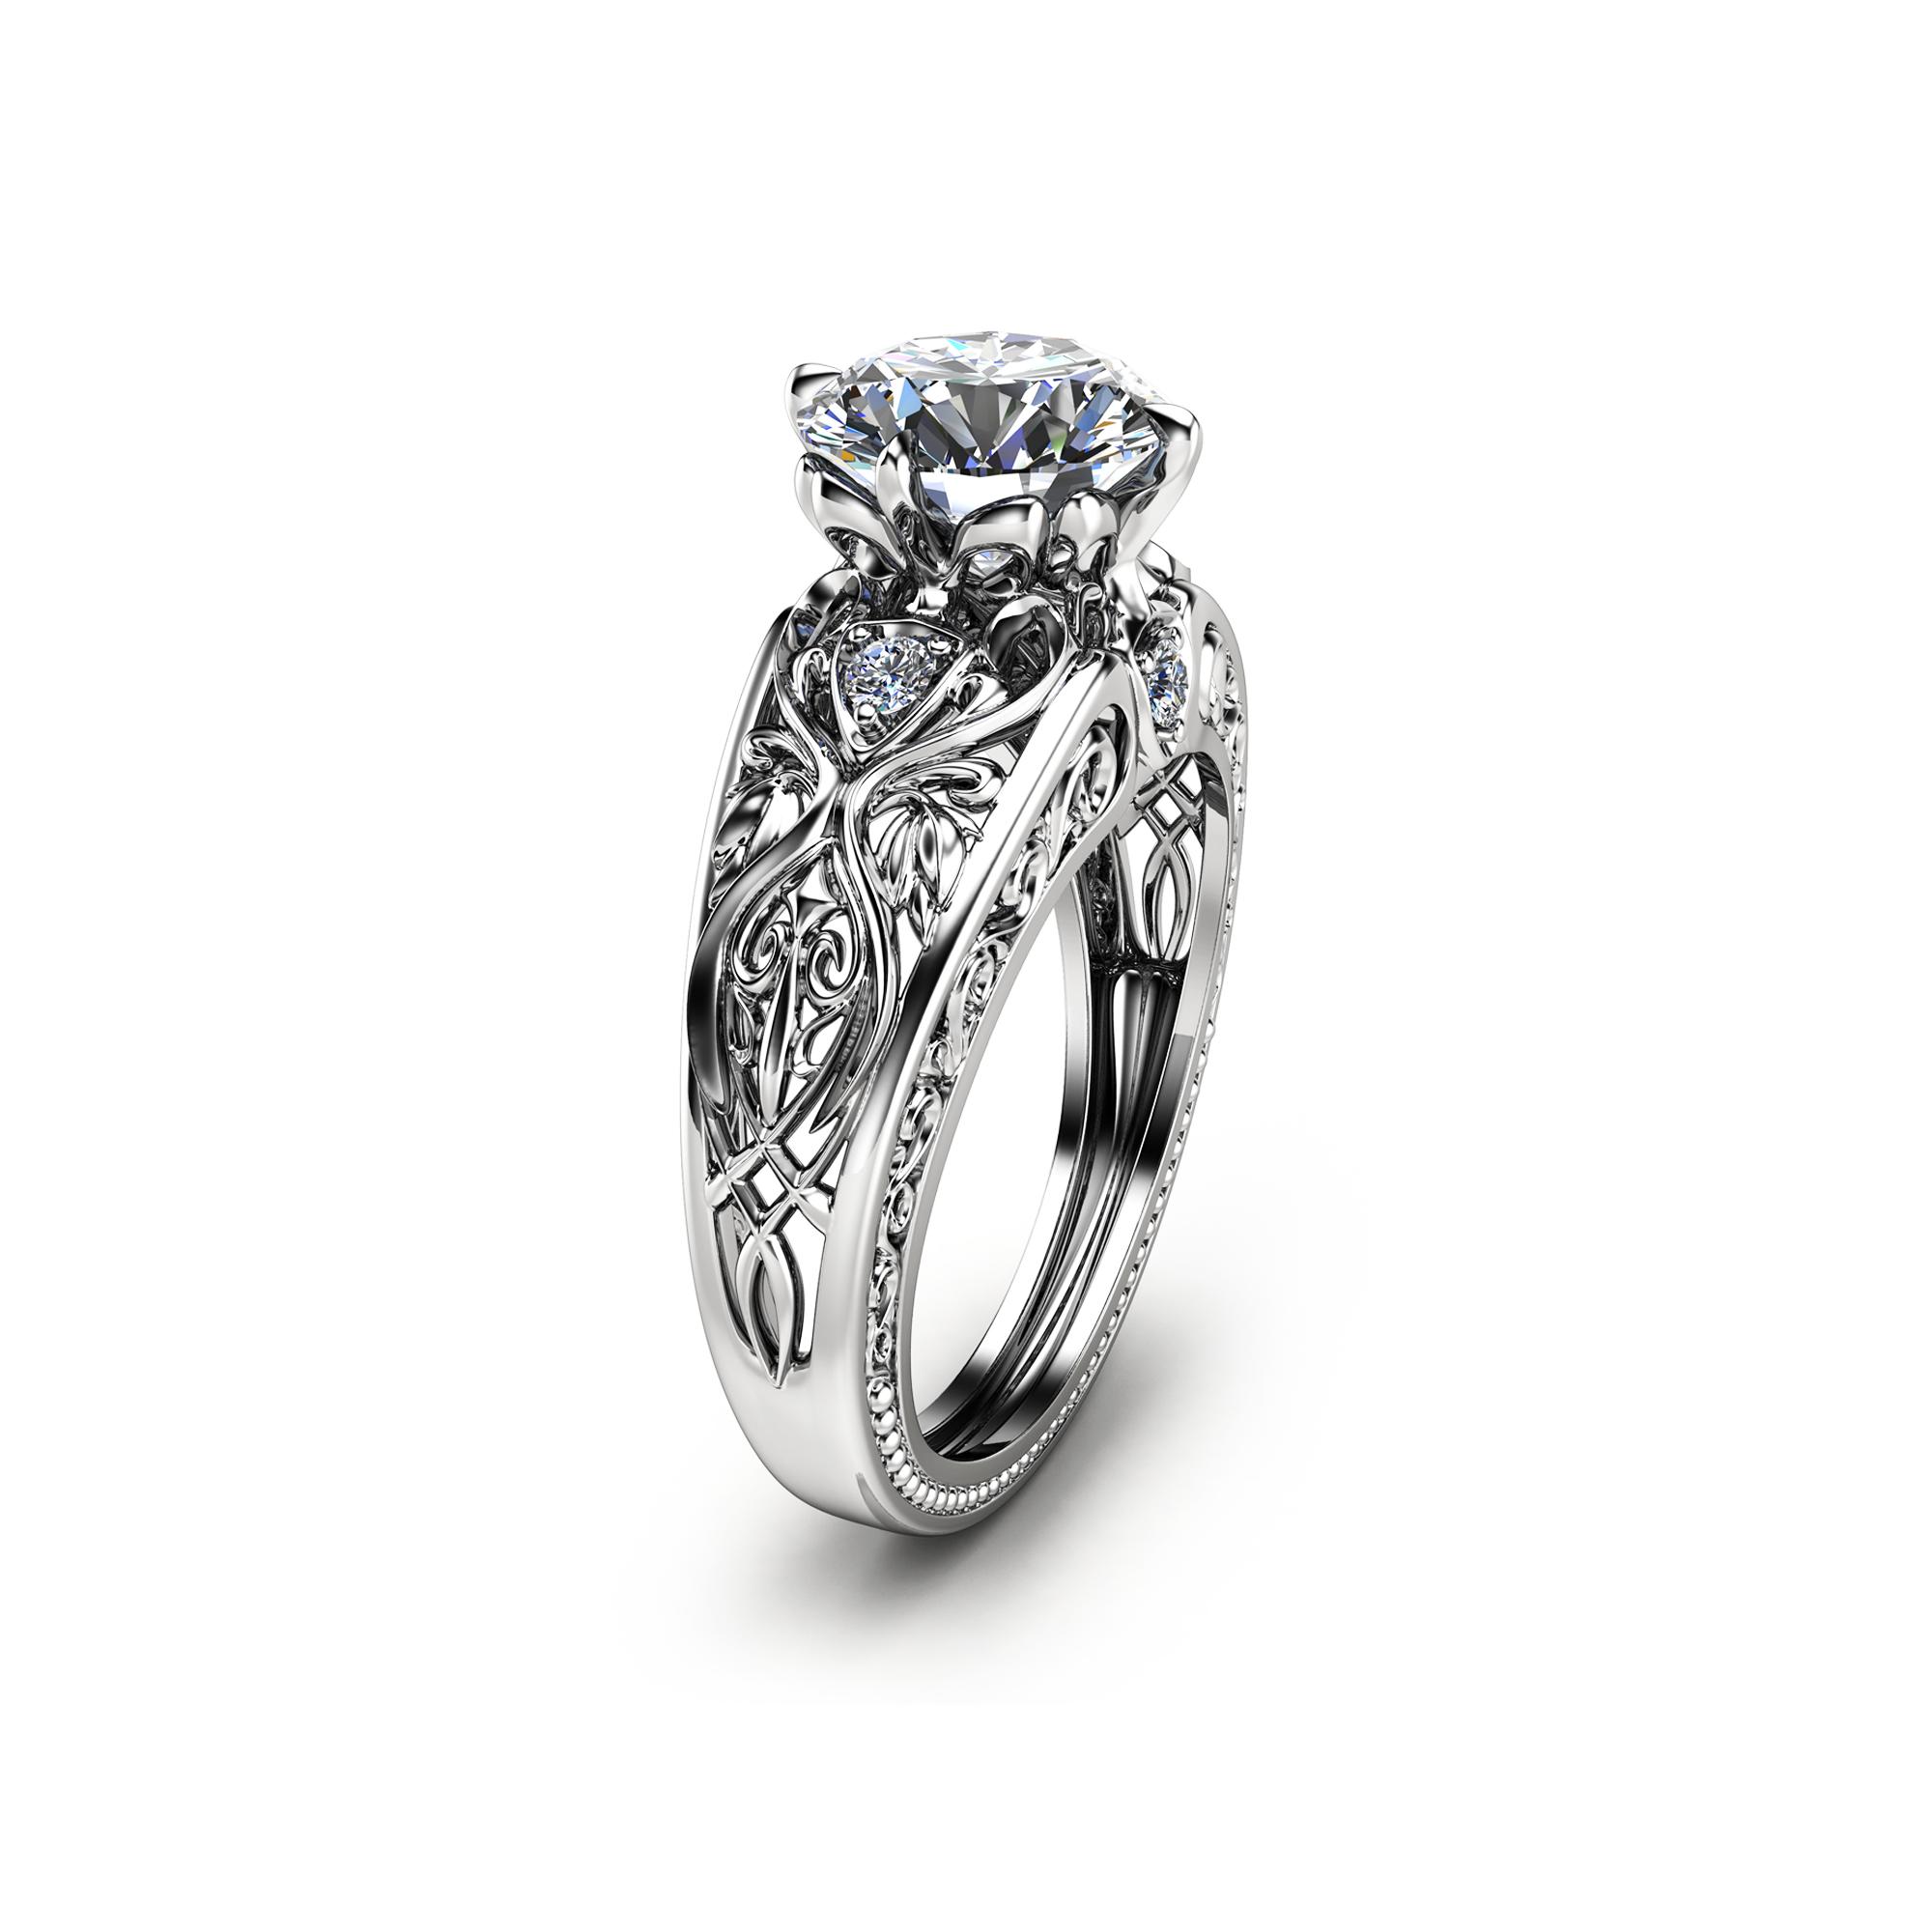 14K White Gold Moissanite Engagement Ring Art Deco Styled Ring Unique Design Wedding Ring